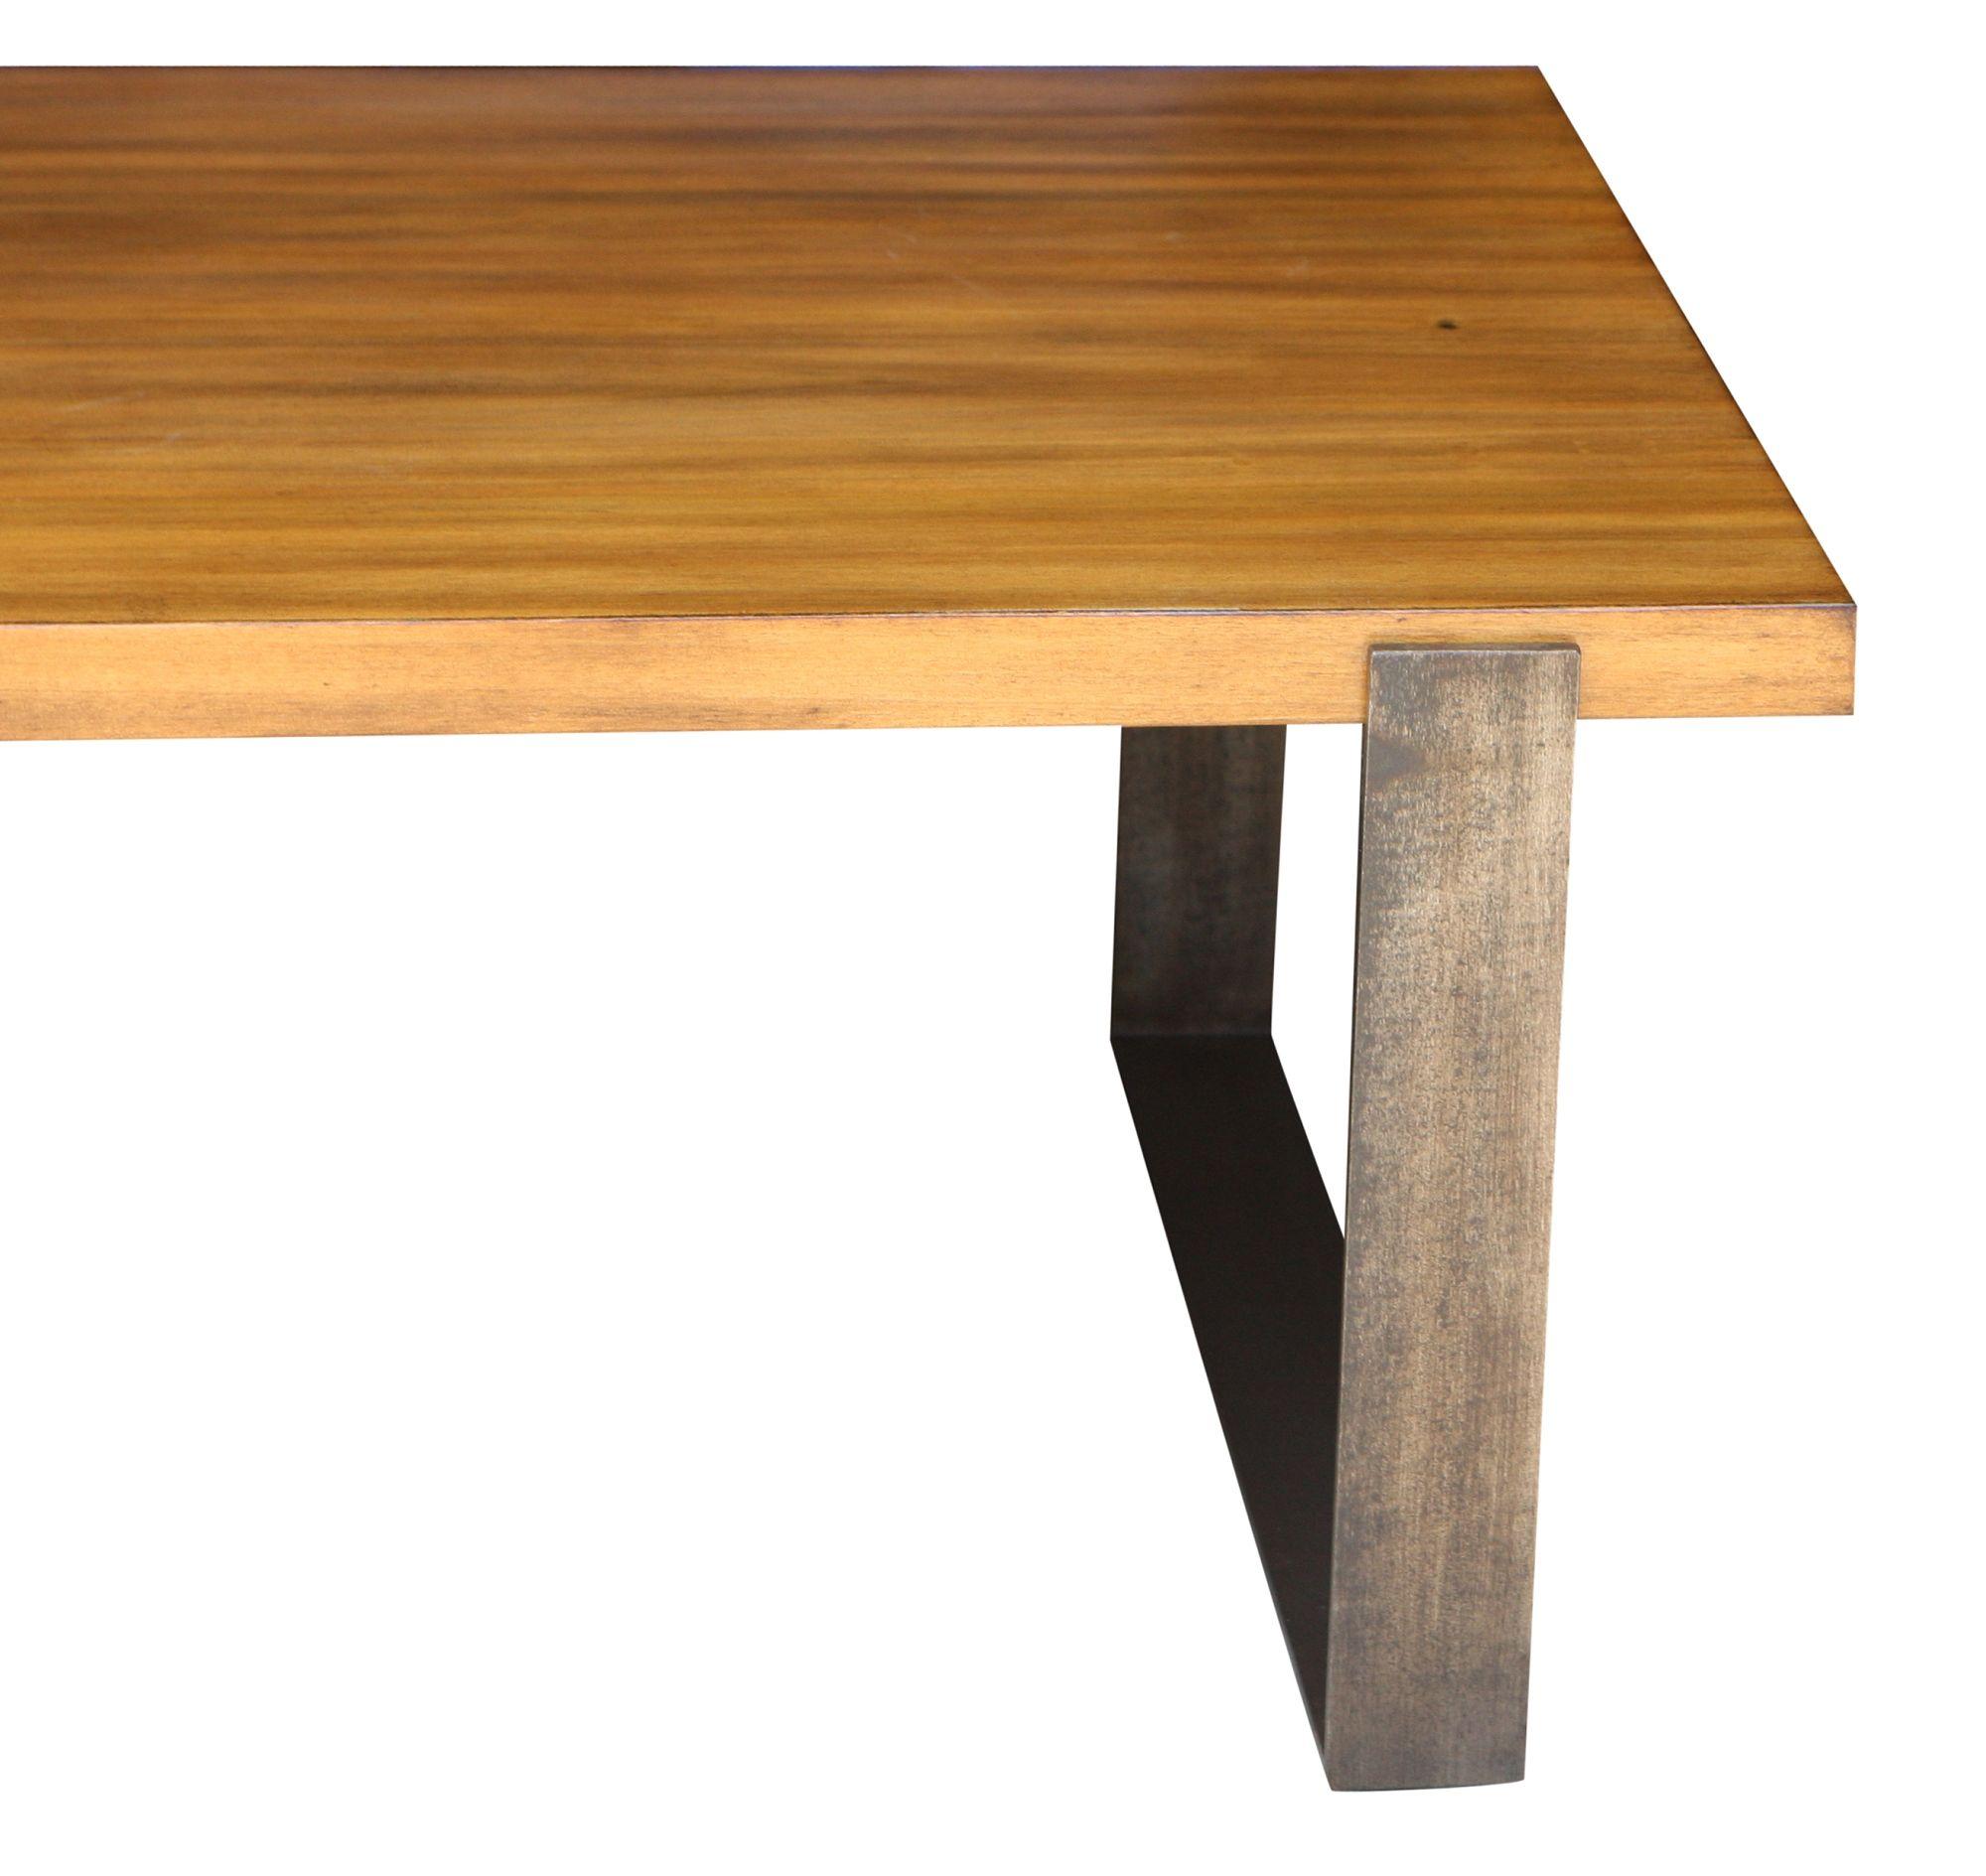 Acacia modern table chairs black metal trim legs google search acacia modern table chairs black metal trim legs google search geotapseo Choice Image